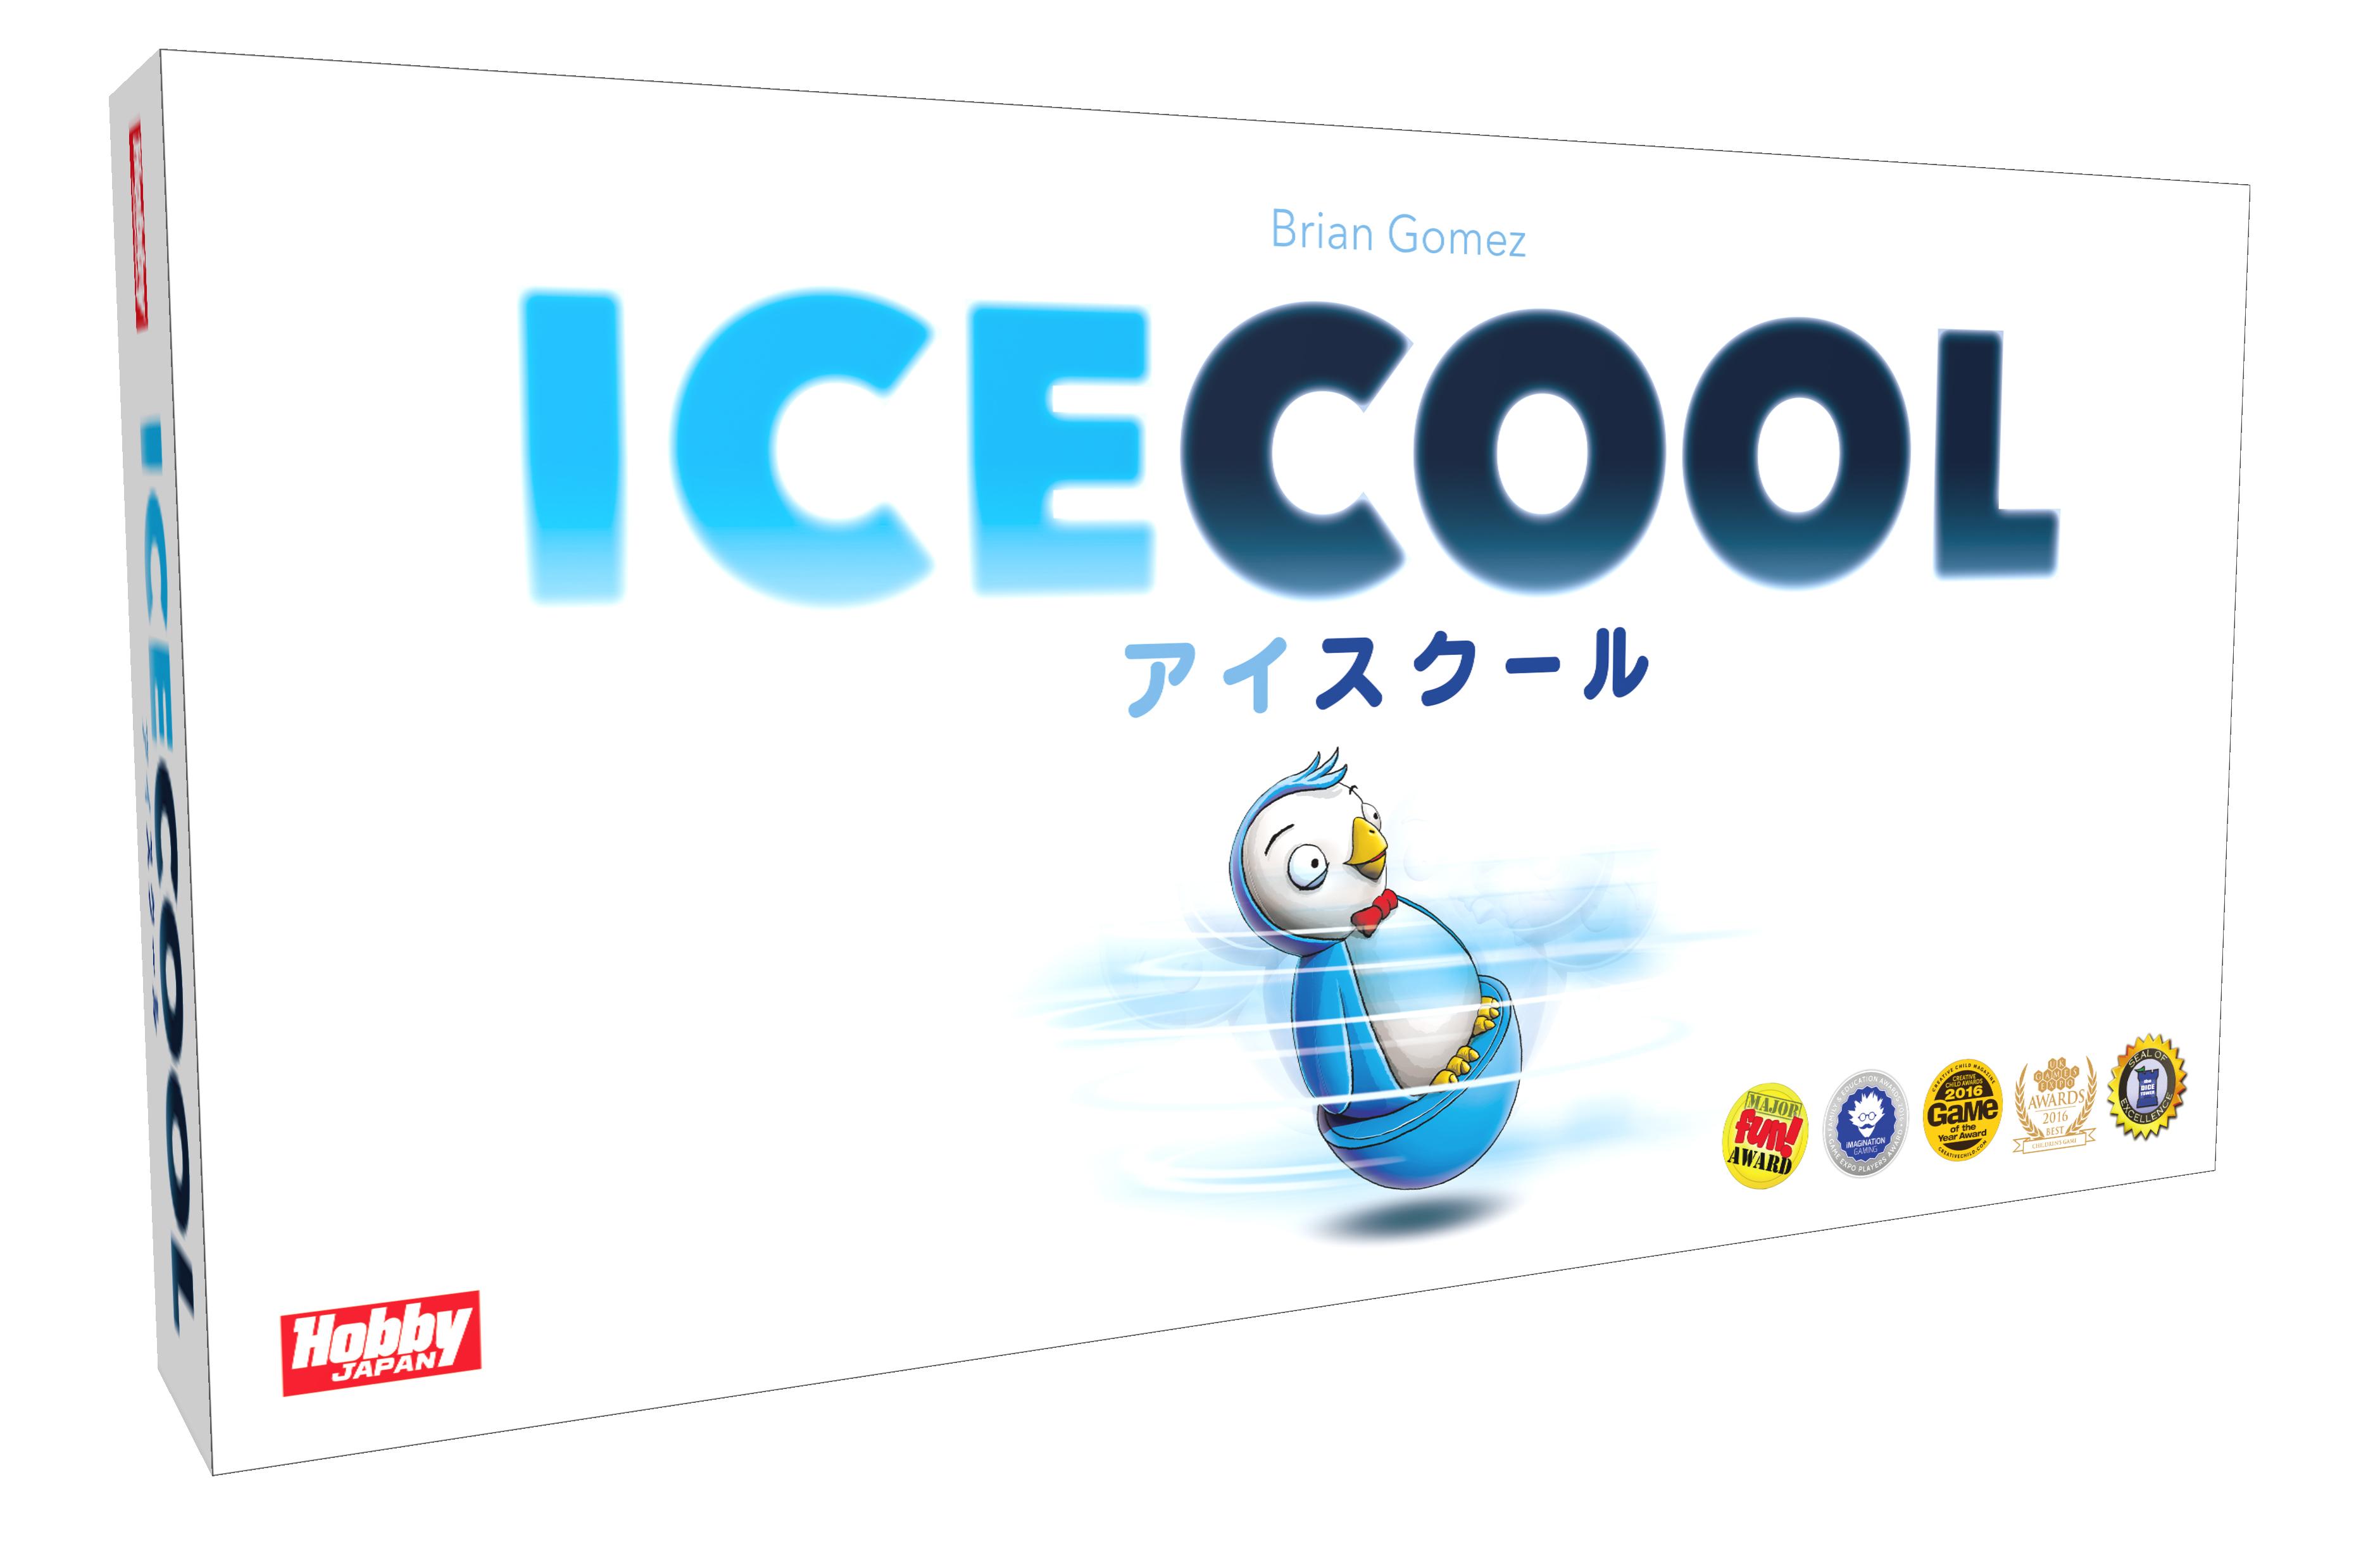 box_icecool_with_5award_logo_jp_left